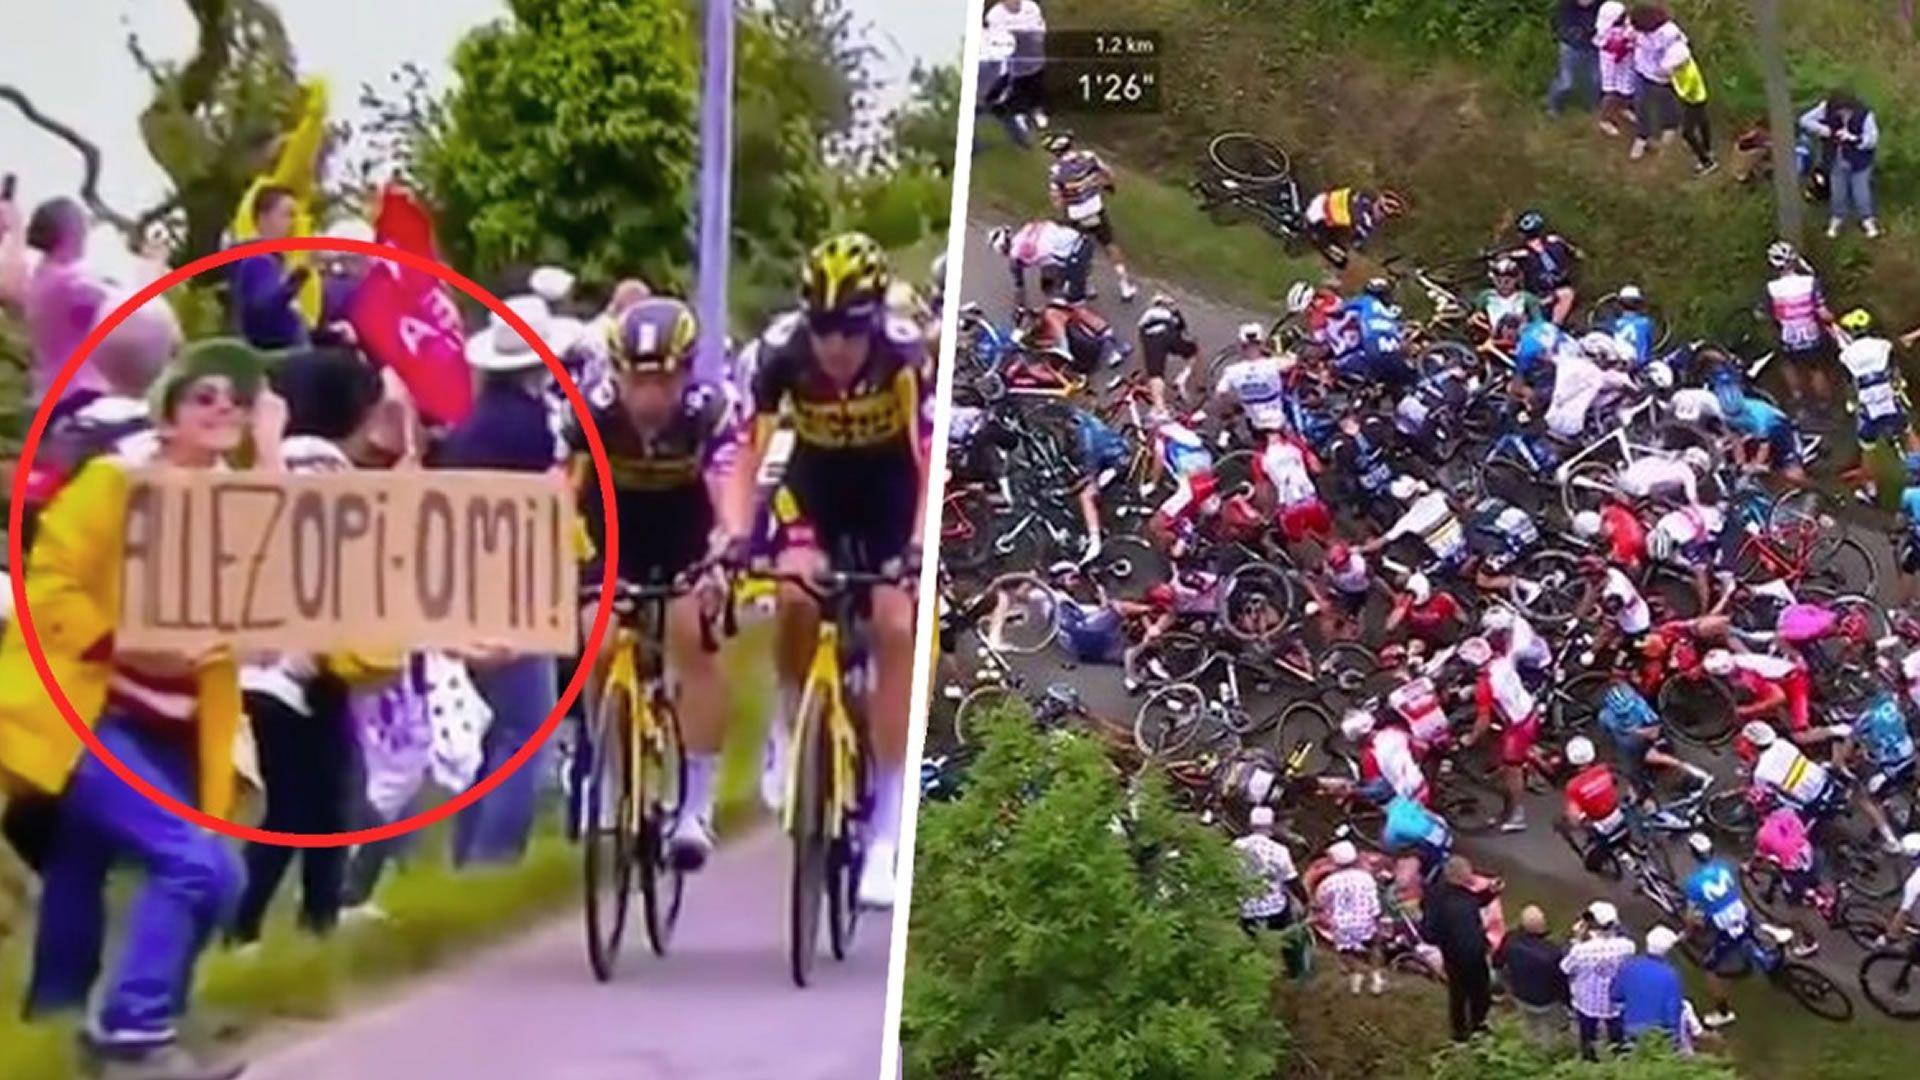 Caída masiva en el Tour de France 2021.